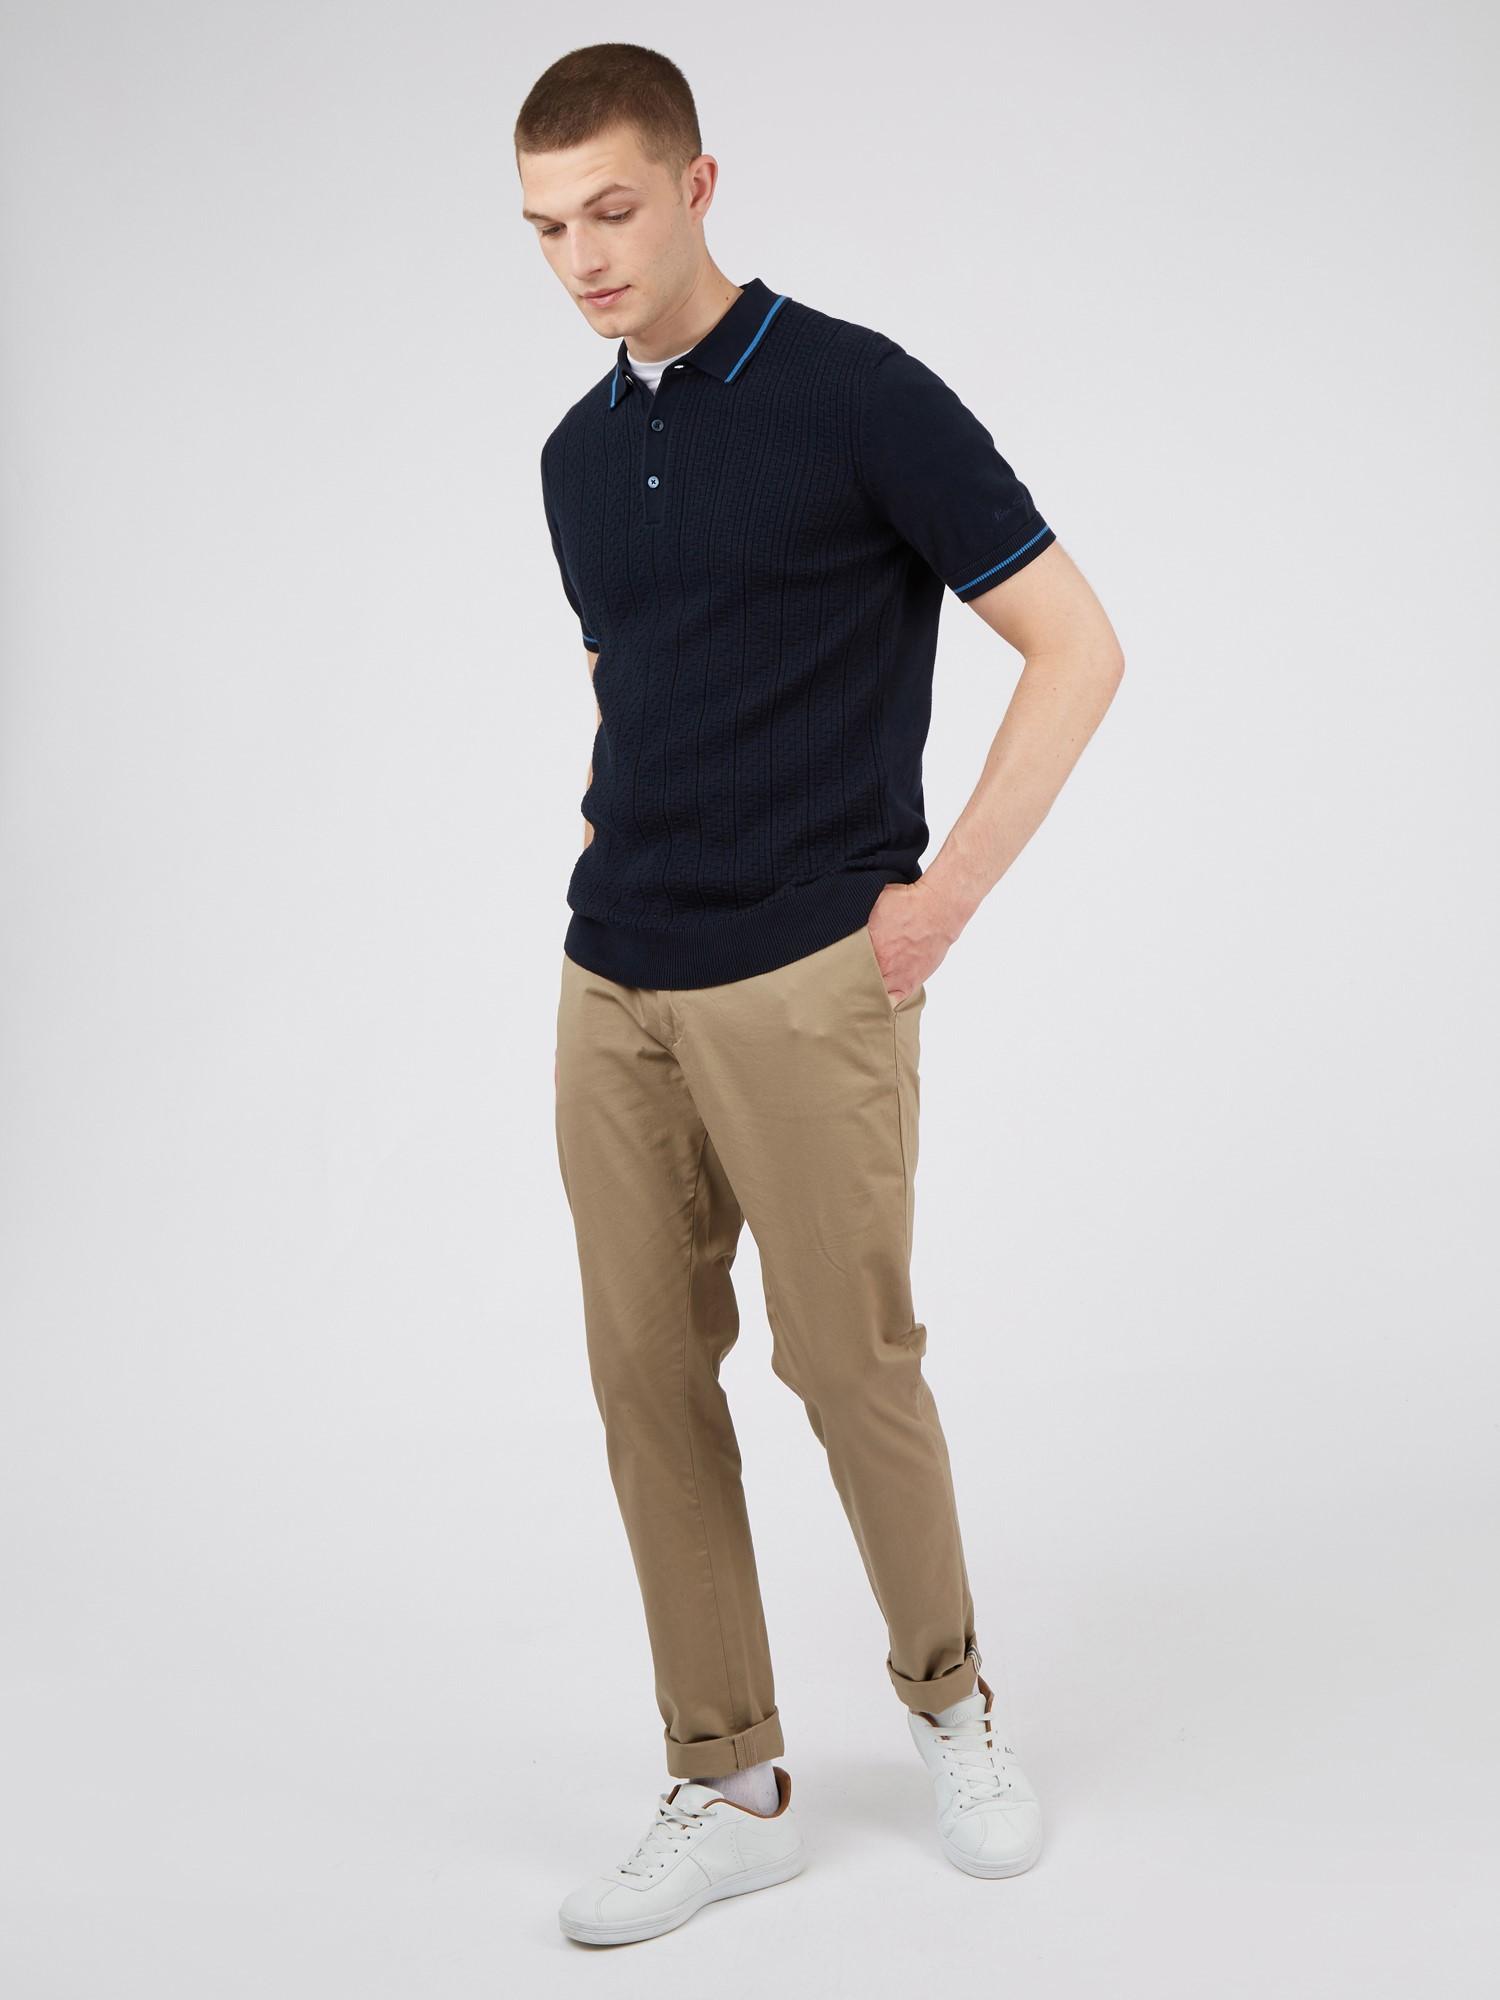 Dark Navy Short Sleeve Textured Front Polo Shirt